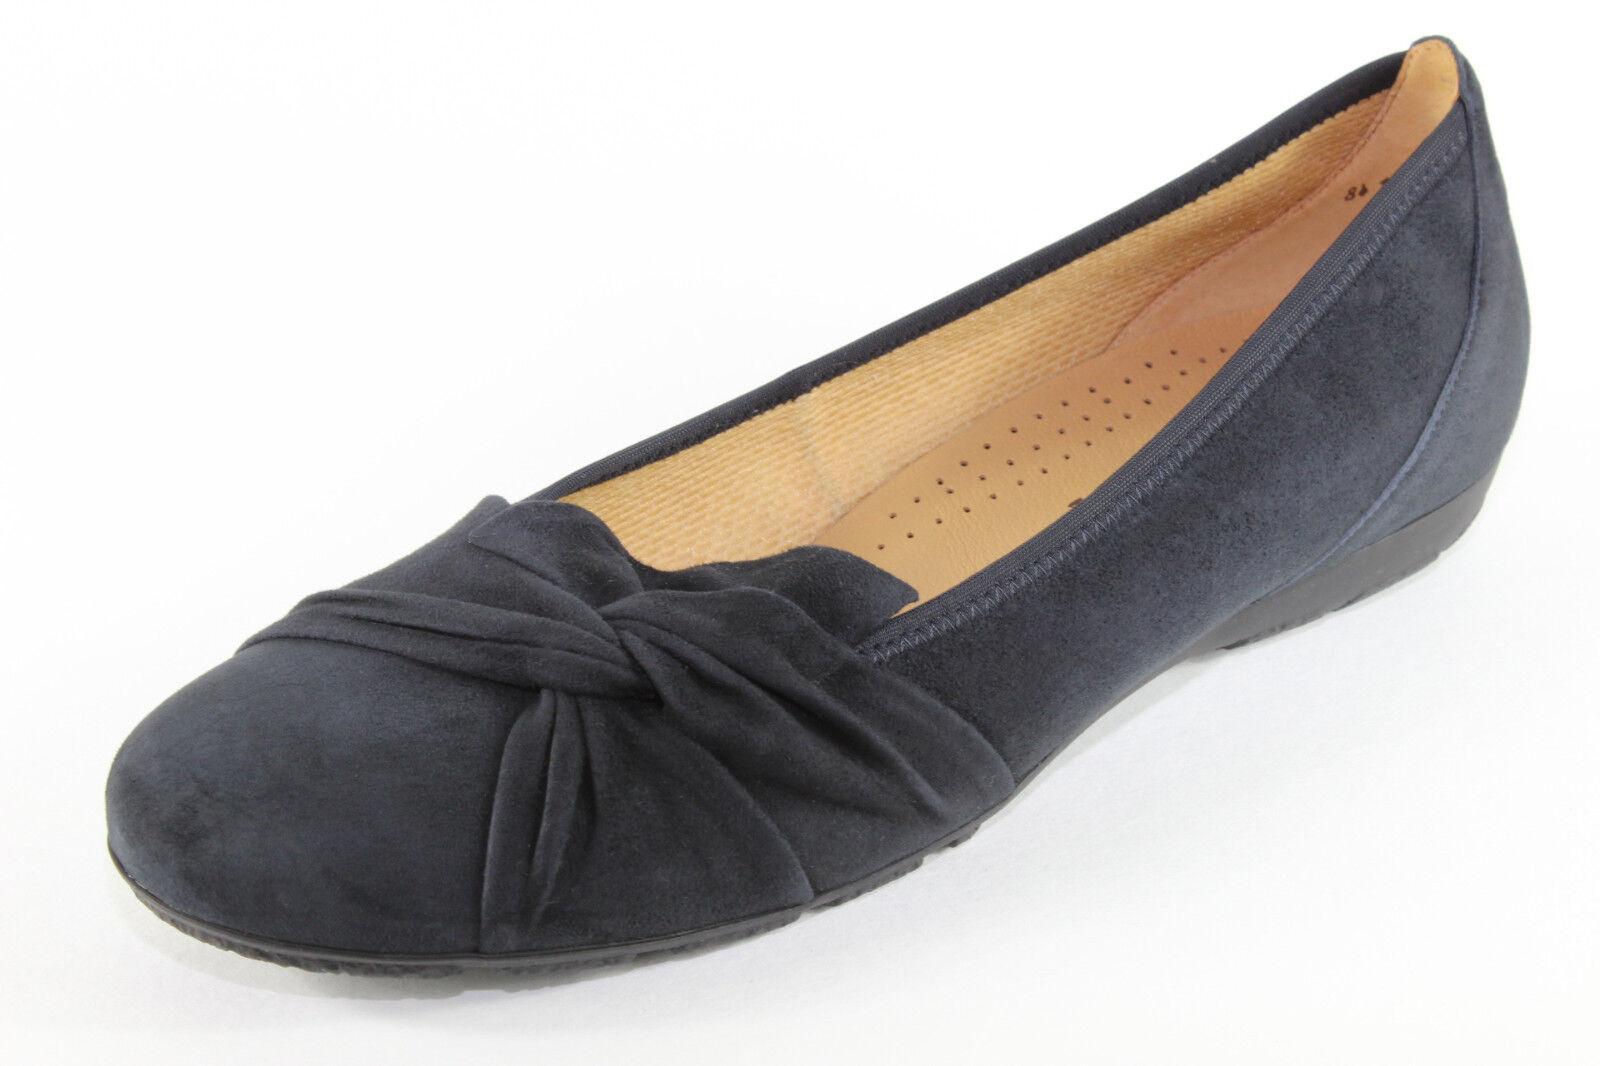 Gabor 84.150.16, komfortable Ballerinas, dunkelblau, Damenschuhe Übergröße